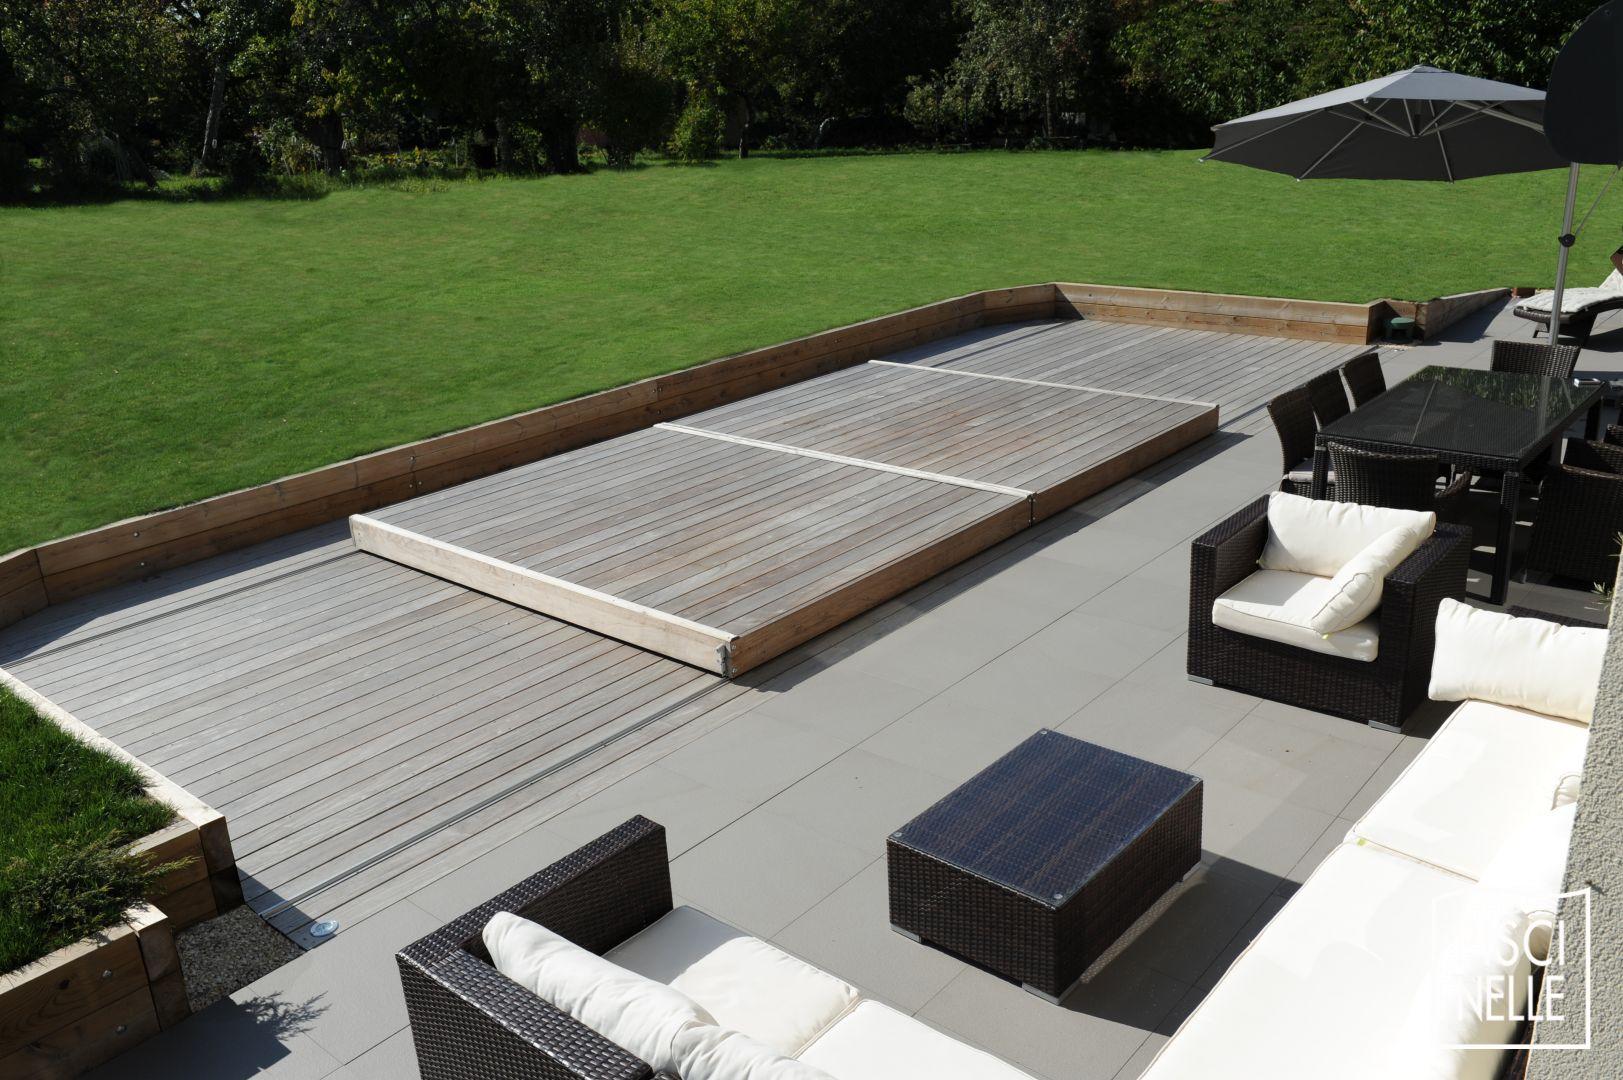 Terrasse Piscine Mobile : Le Rolling-Deck Piscinelle ... avec Rolling Deck Prix